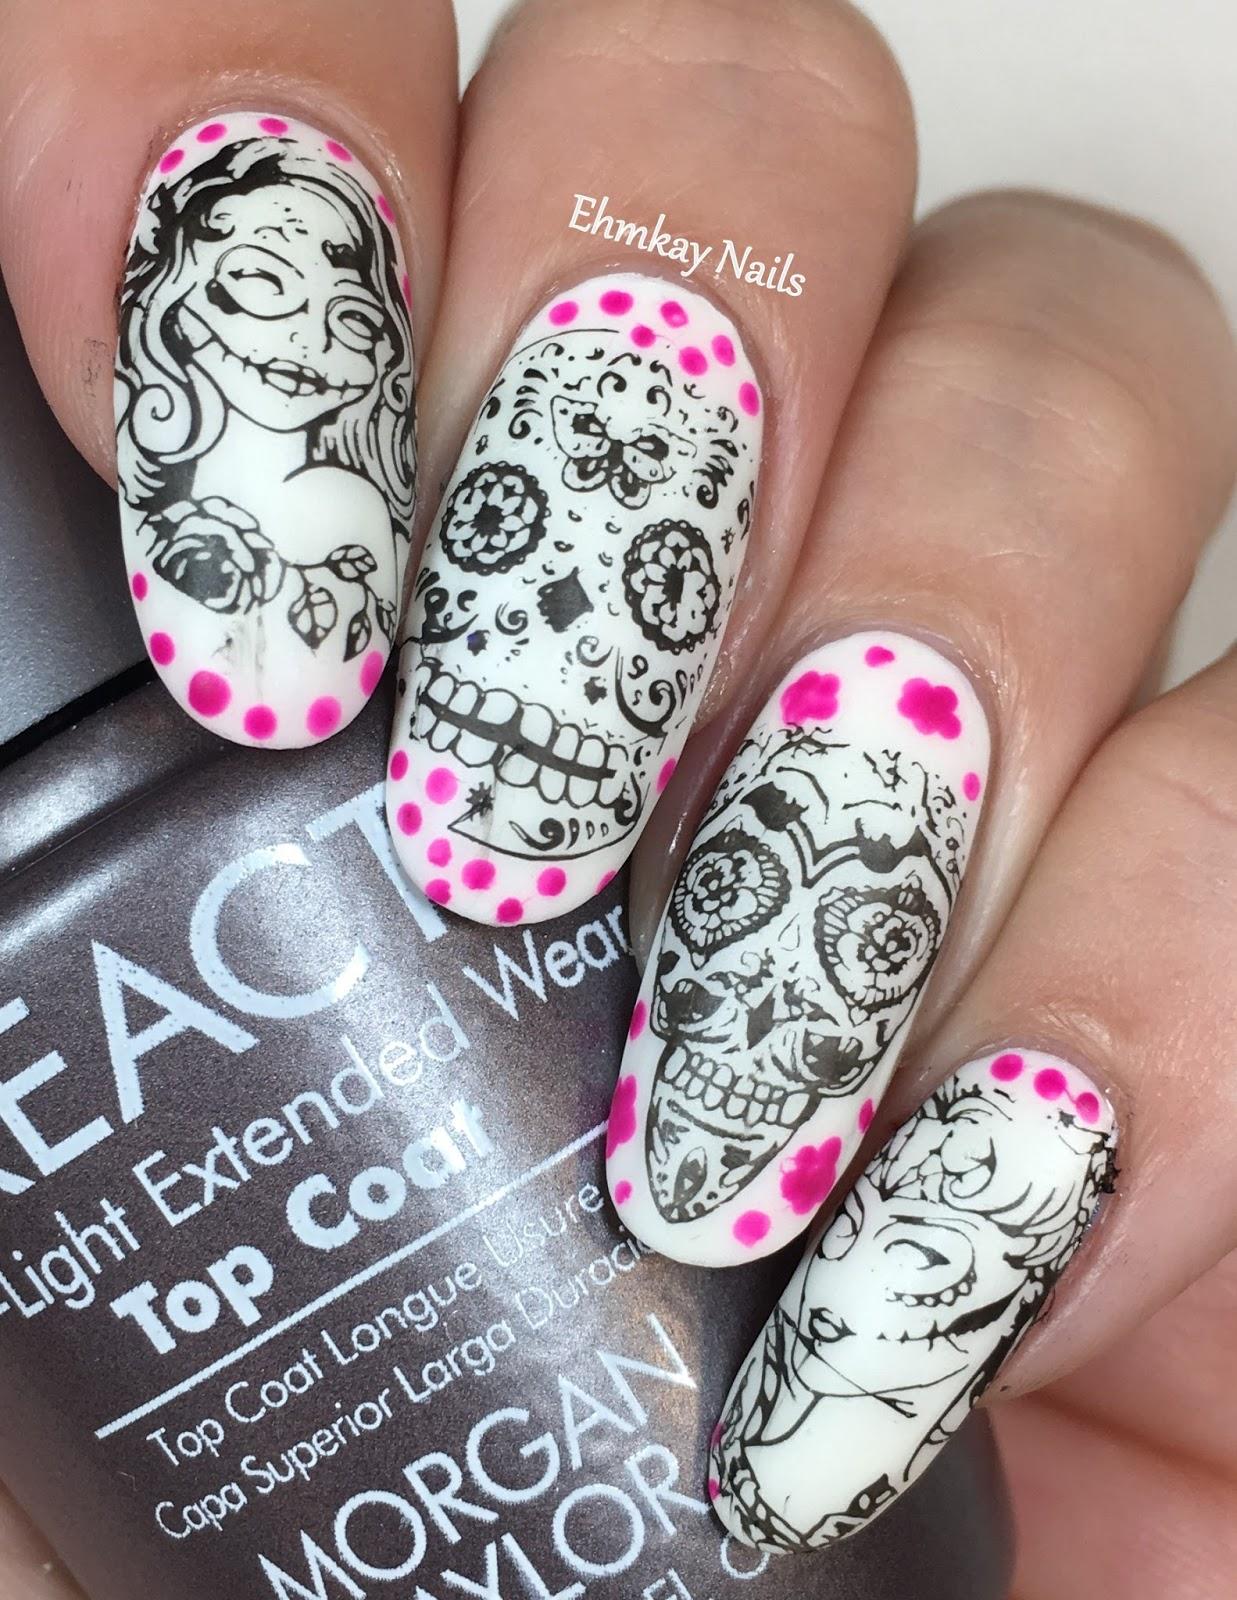 ehmkay nails: Halloween Nail Art: Glow in the Dark Sugar Skull Nail ...